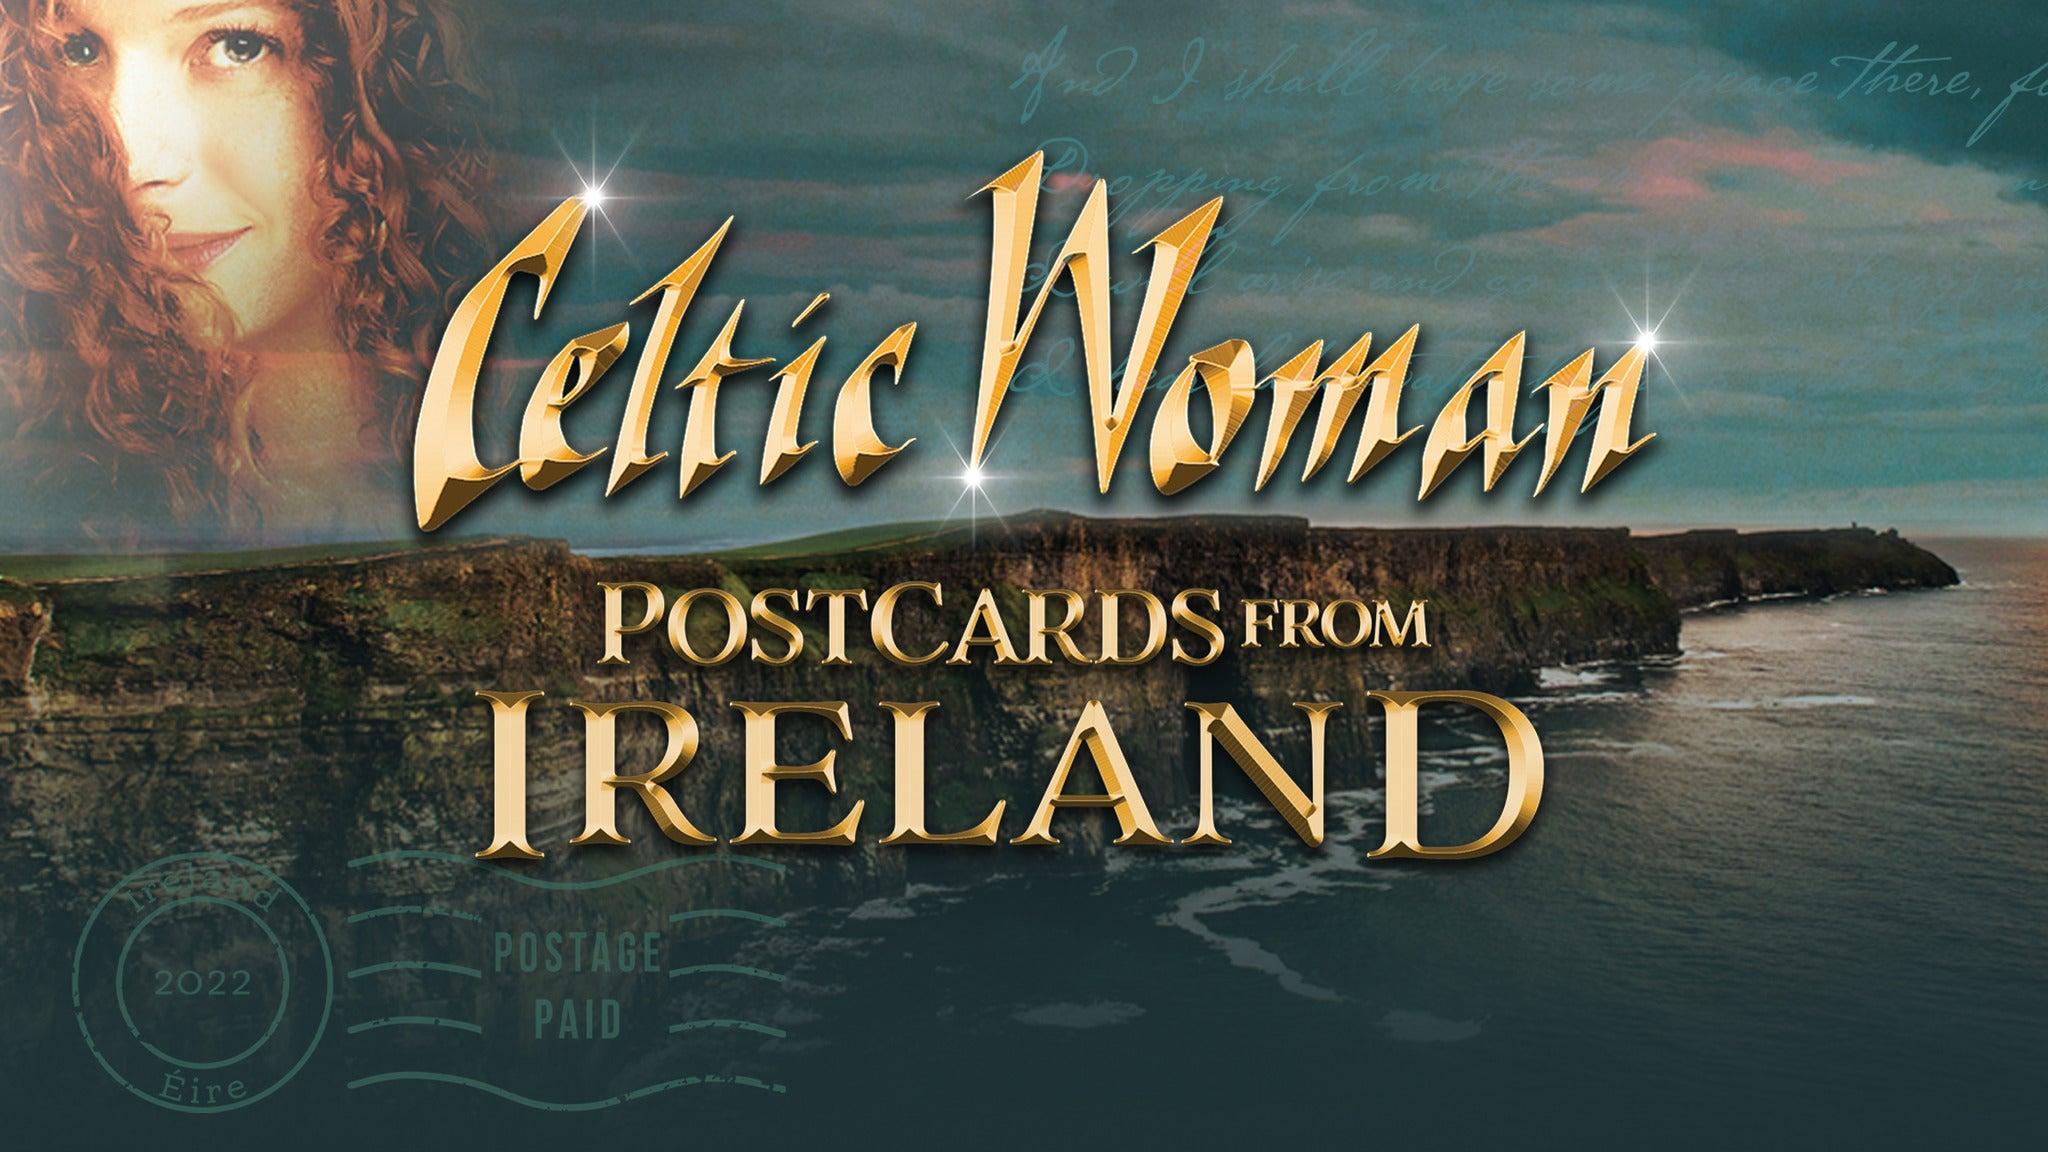 Celtic Woman at Ovens Auditorium